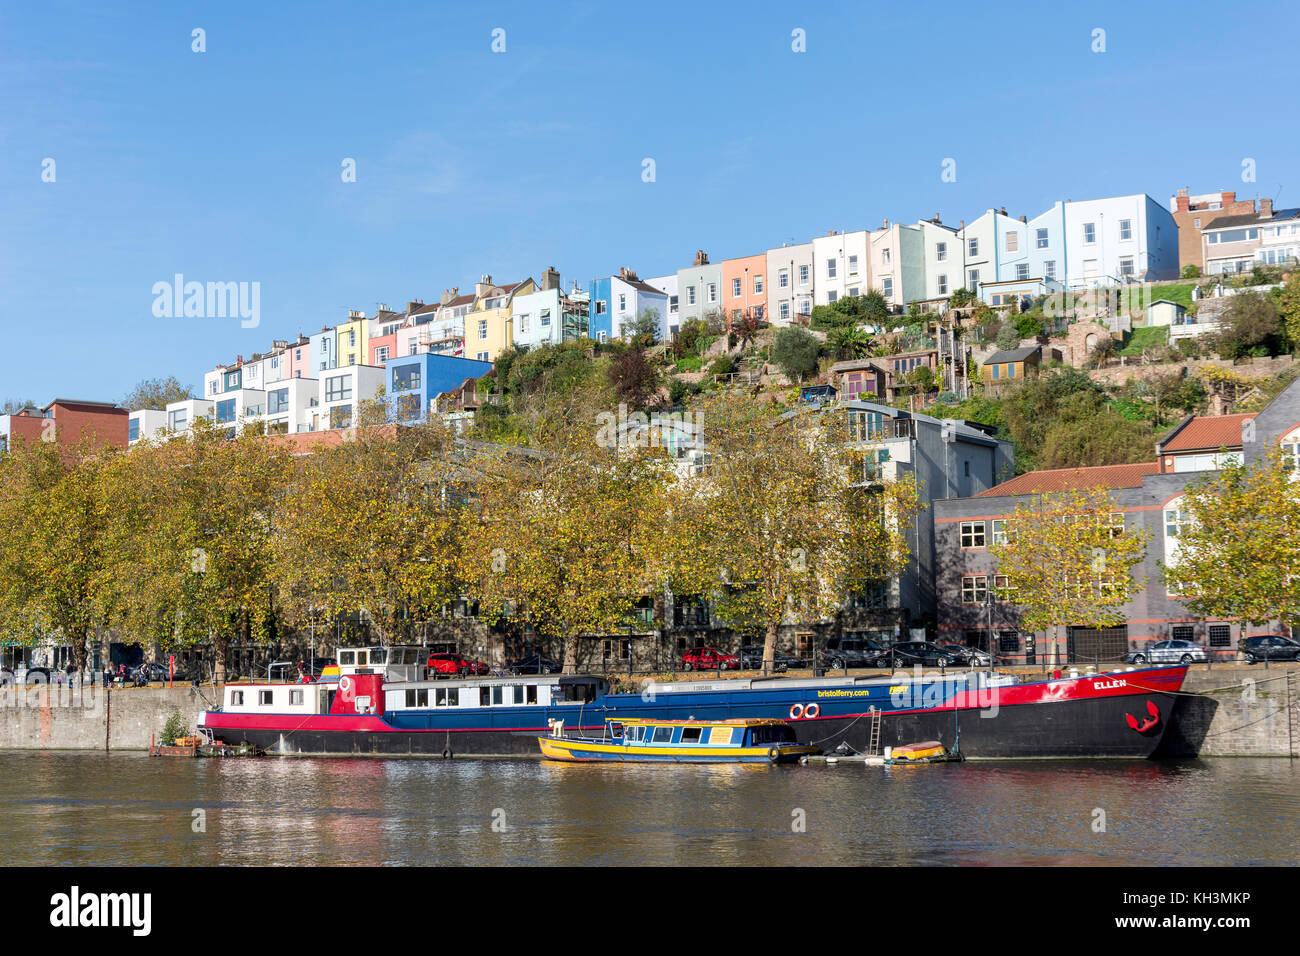 Ferry boats on riverside, Floating Harbour, Clifton Wood, Bristol, England, United Kingdom - Stock Image